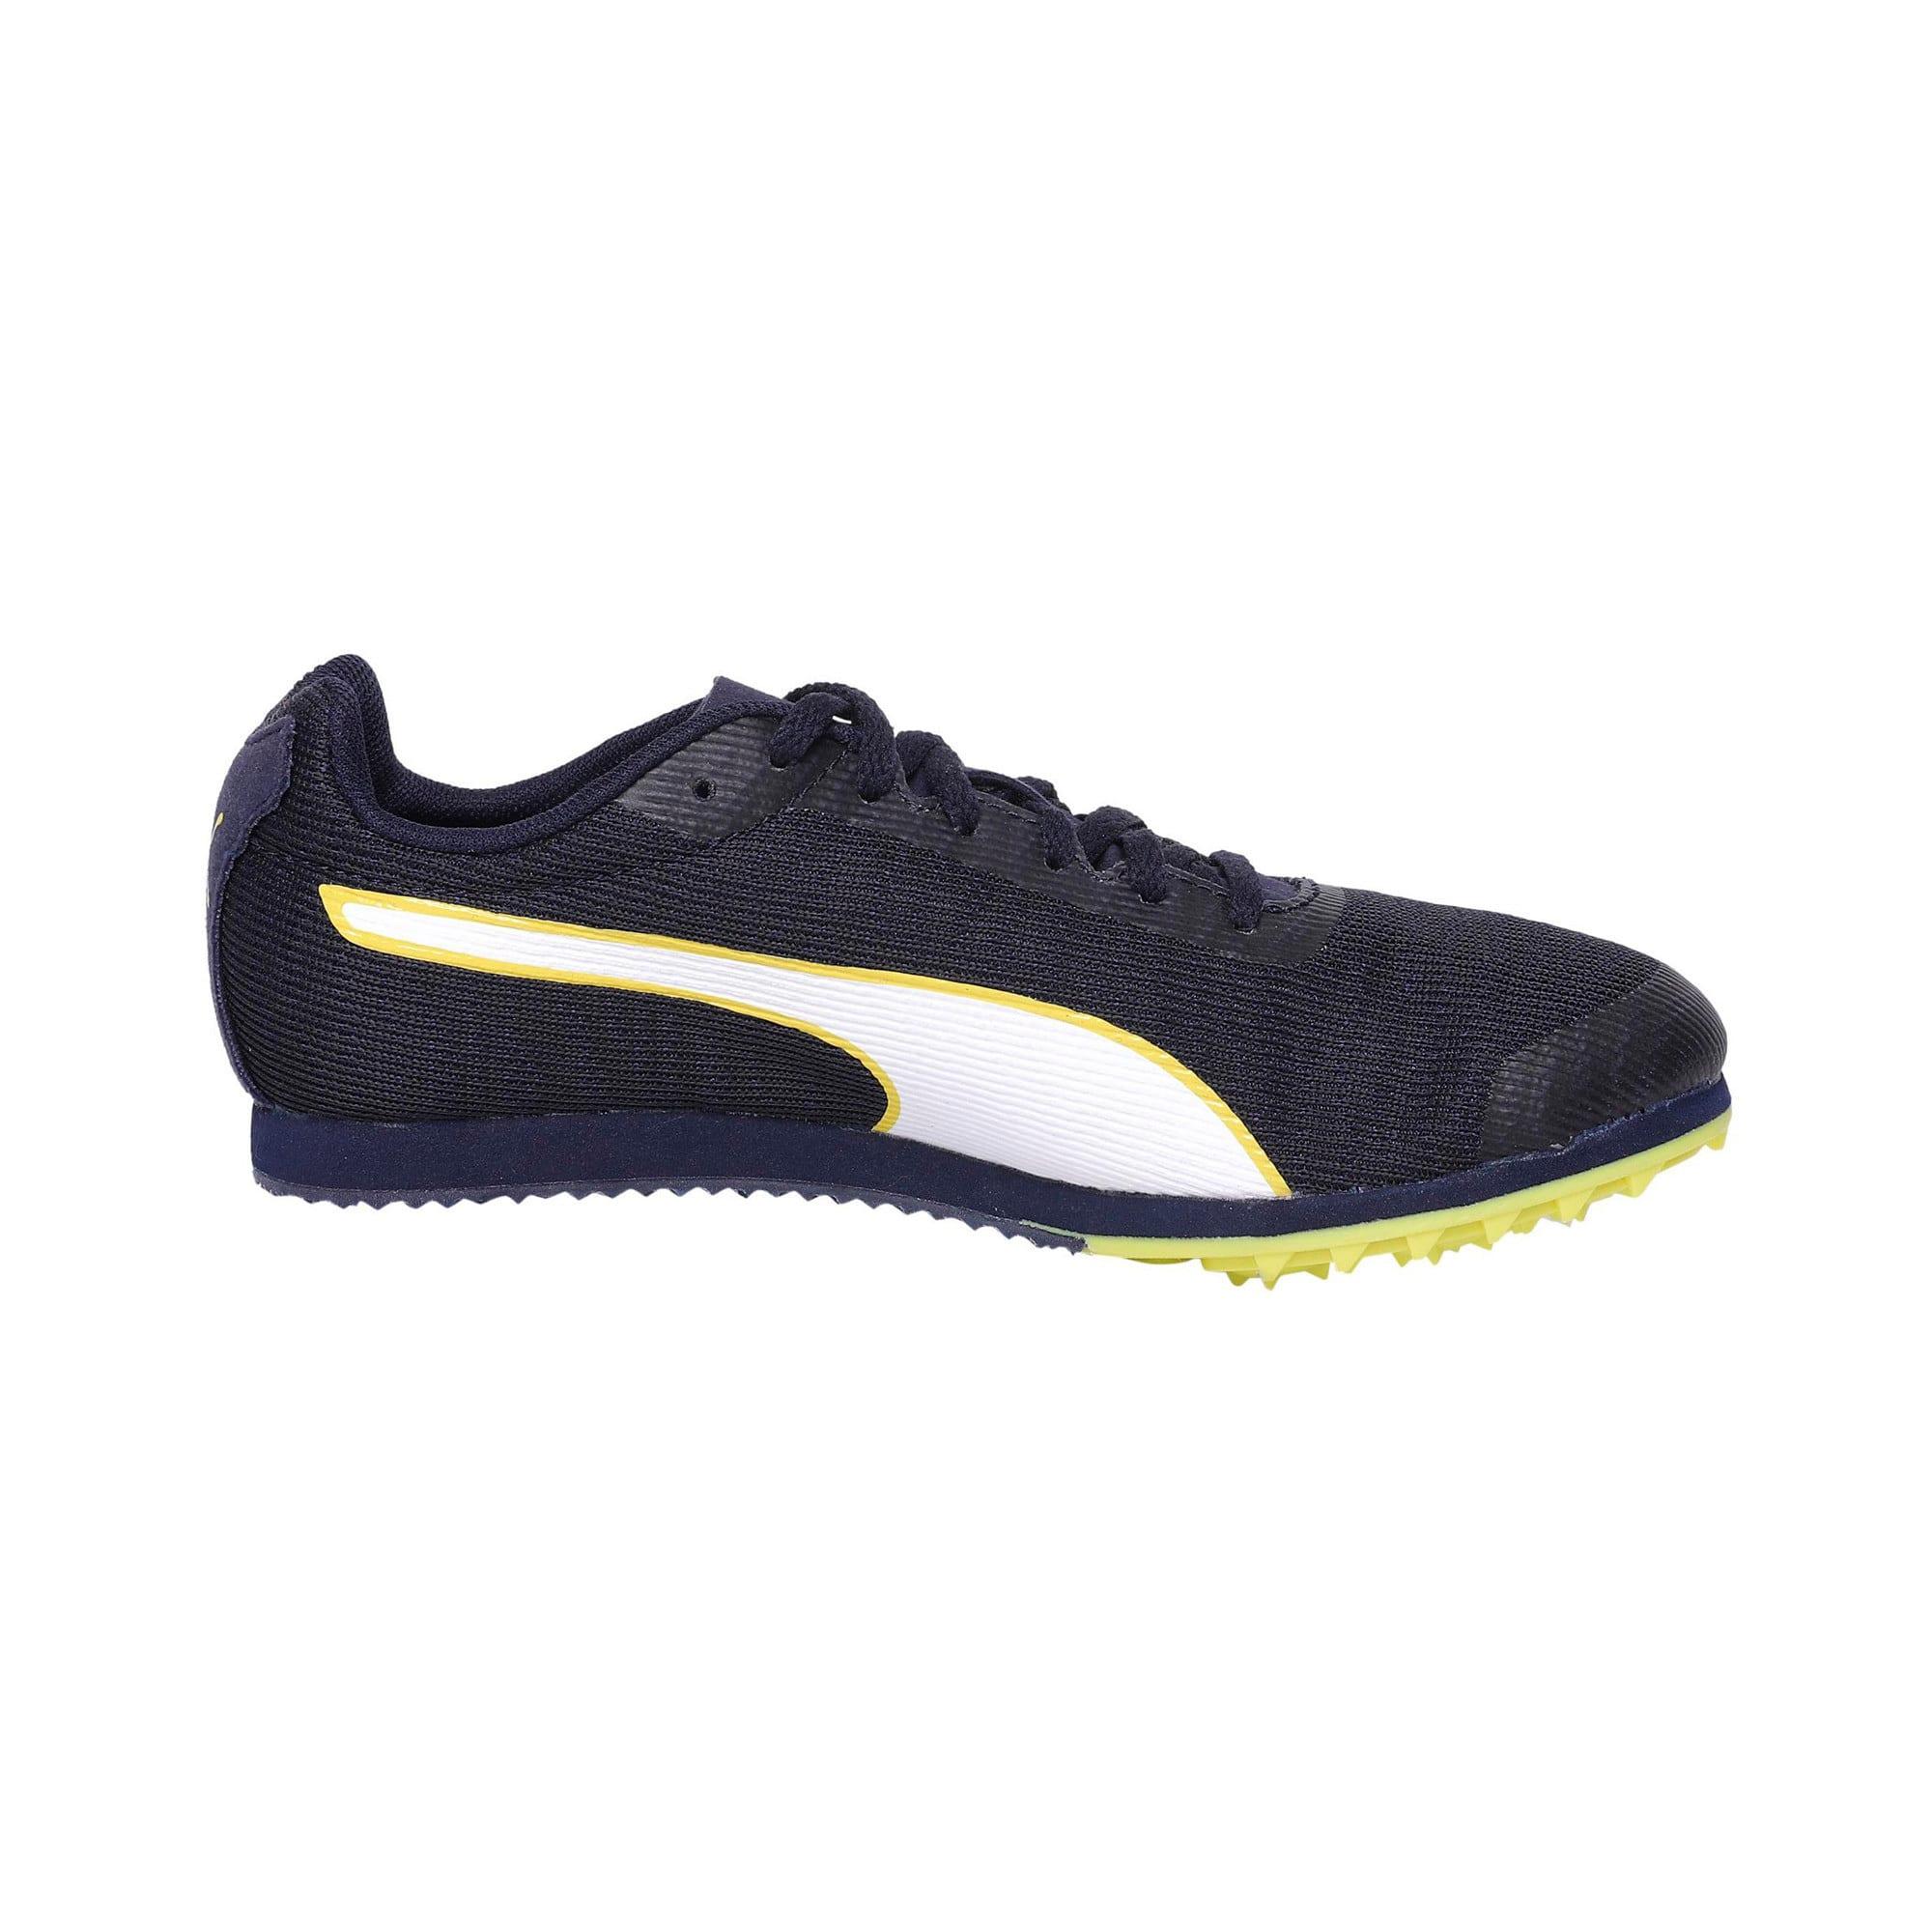 Thumbnail 5 of evoSPEED Star 6 Kids' Running Shoes, Peacoat-Puma Black-Yellow, medium-IND